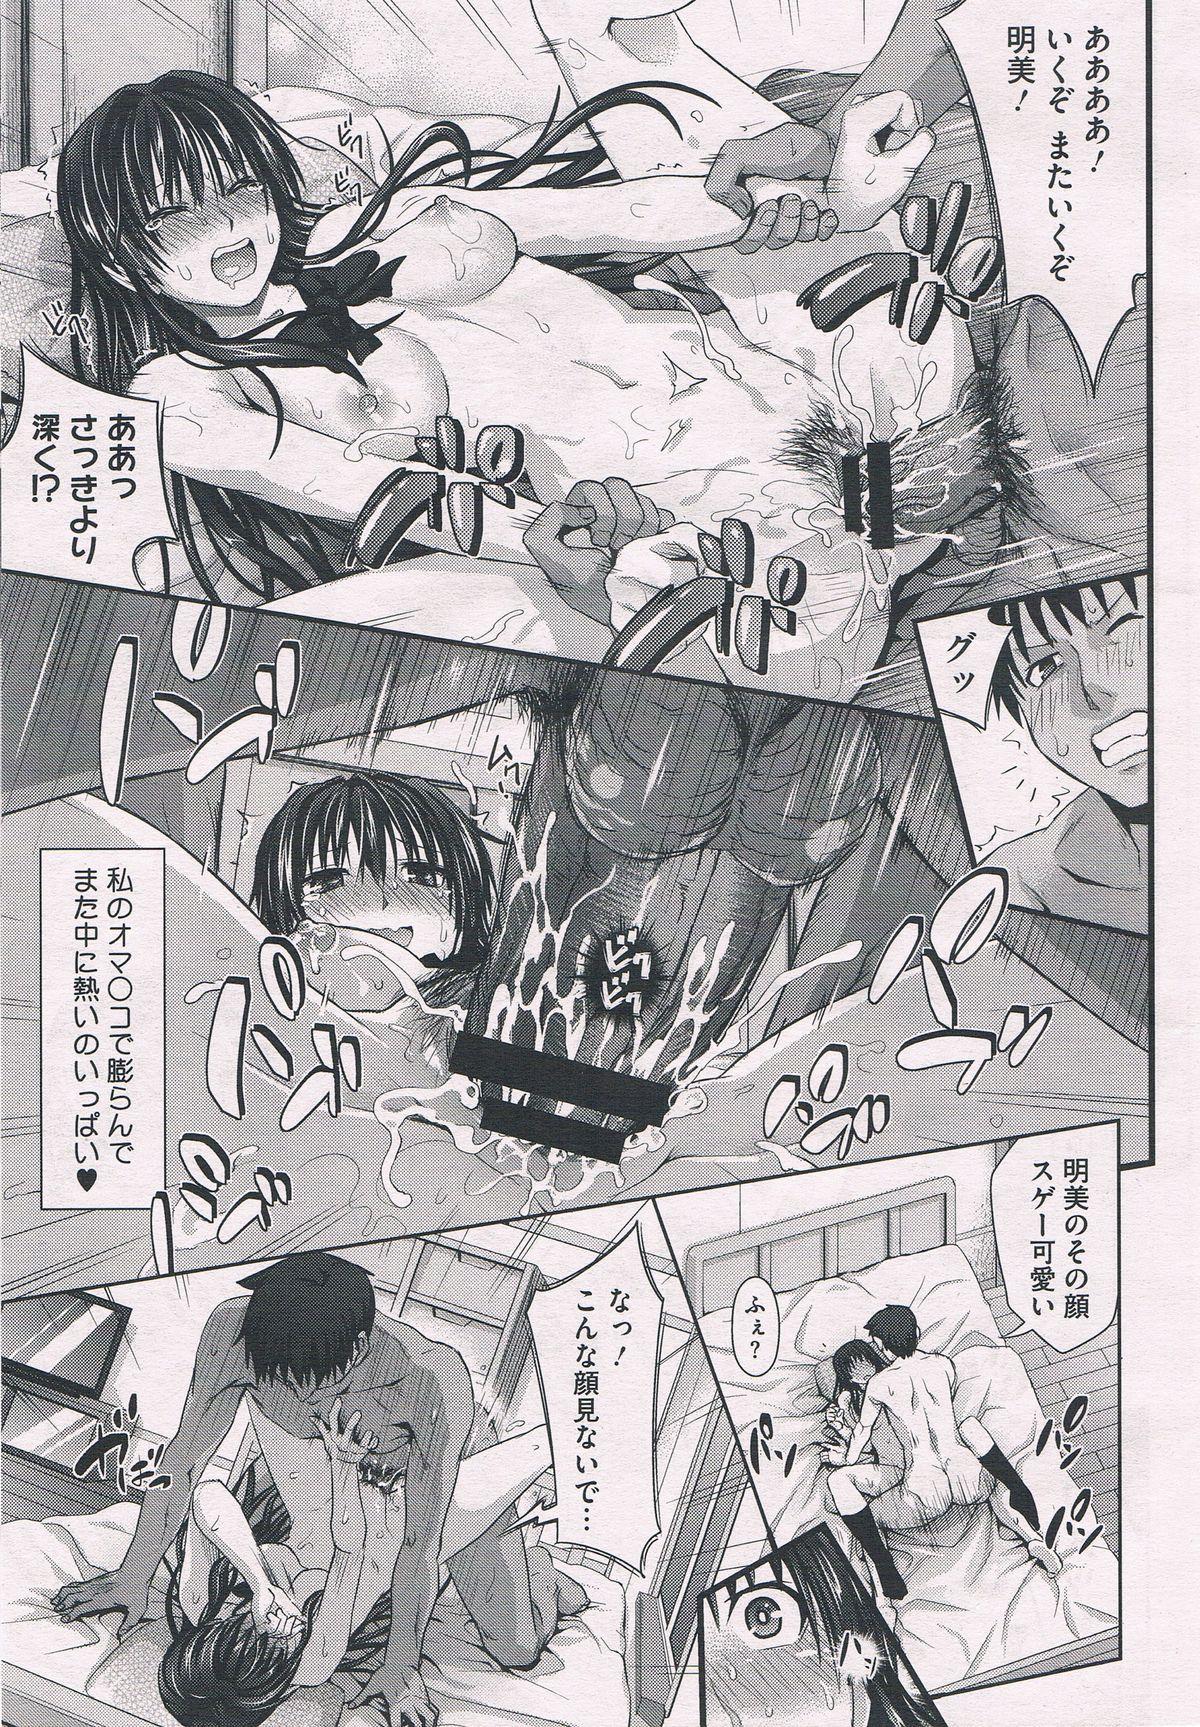 Migite no koibito COMIC Megastore 2012-07 22